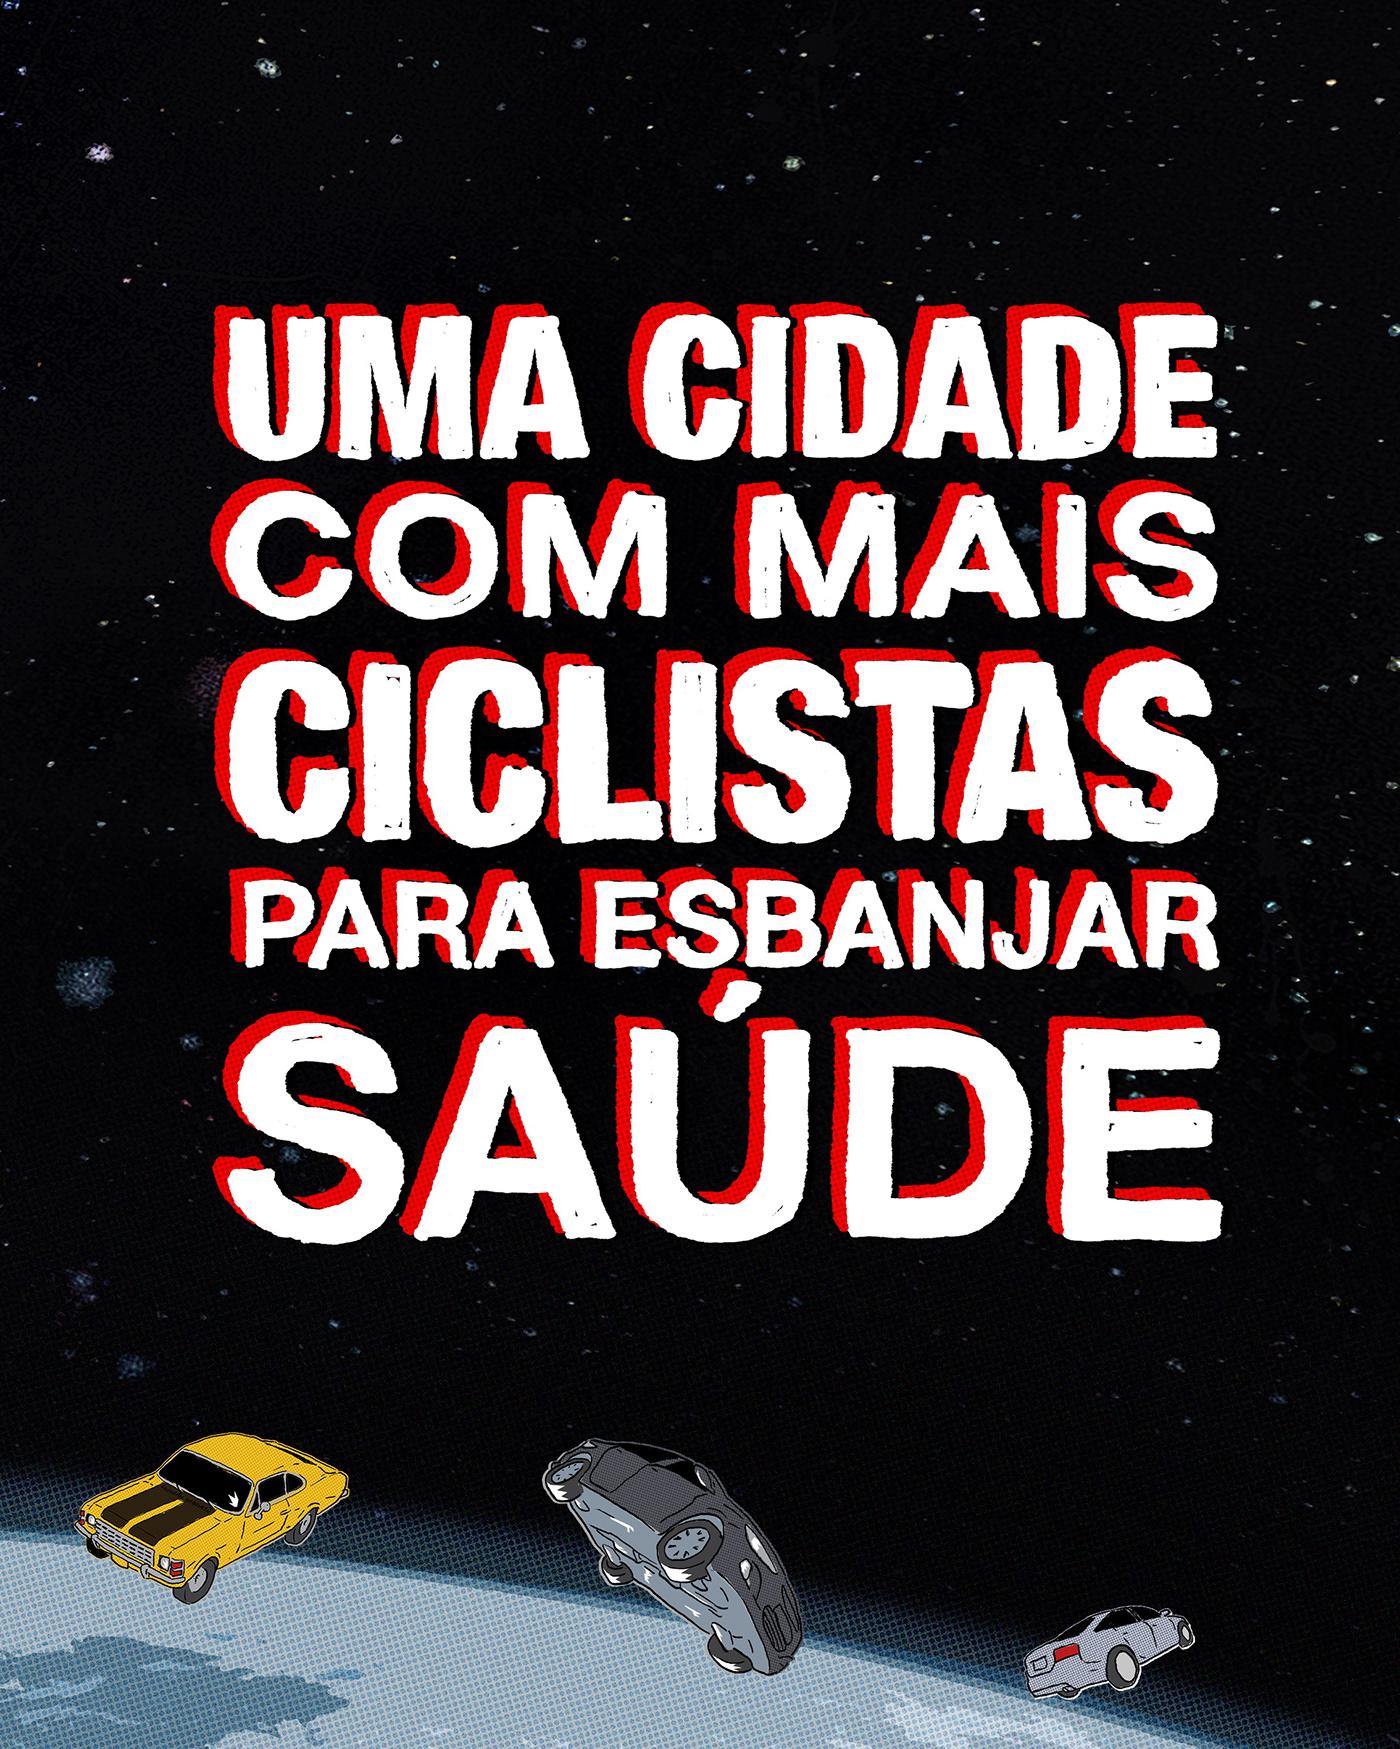 bicicleta bycicle ILLUSTRATION